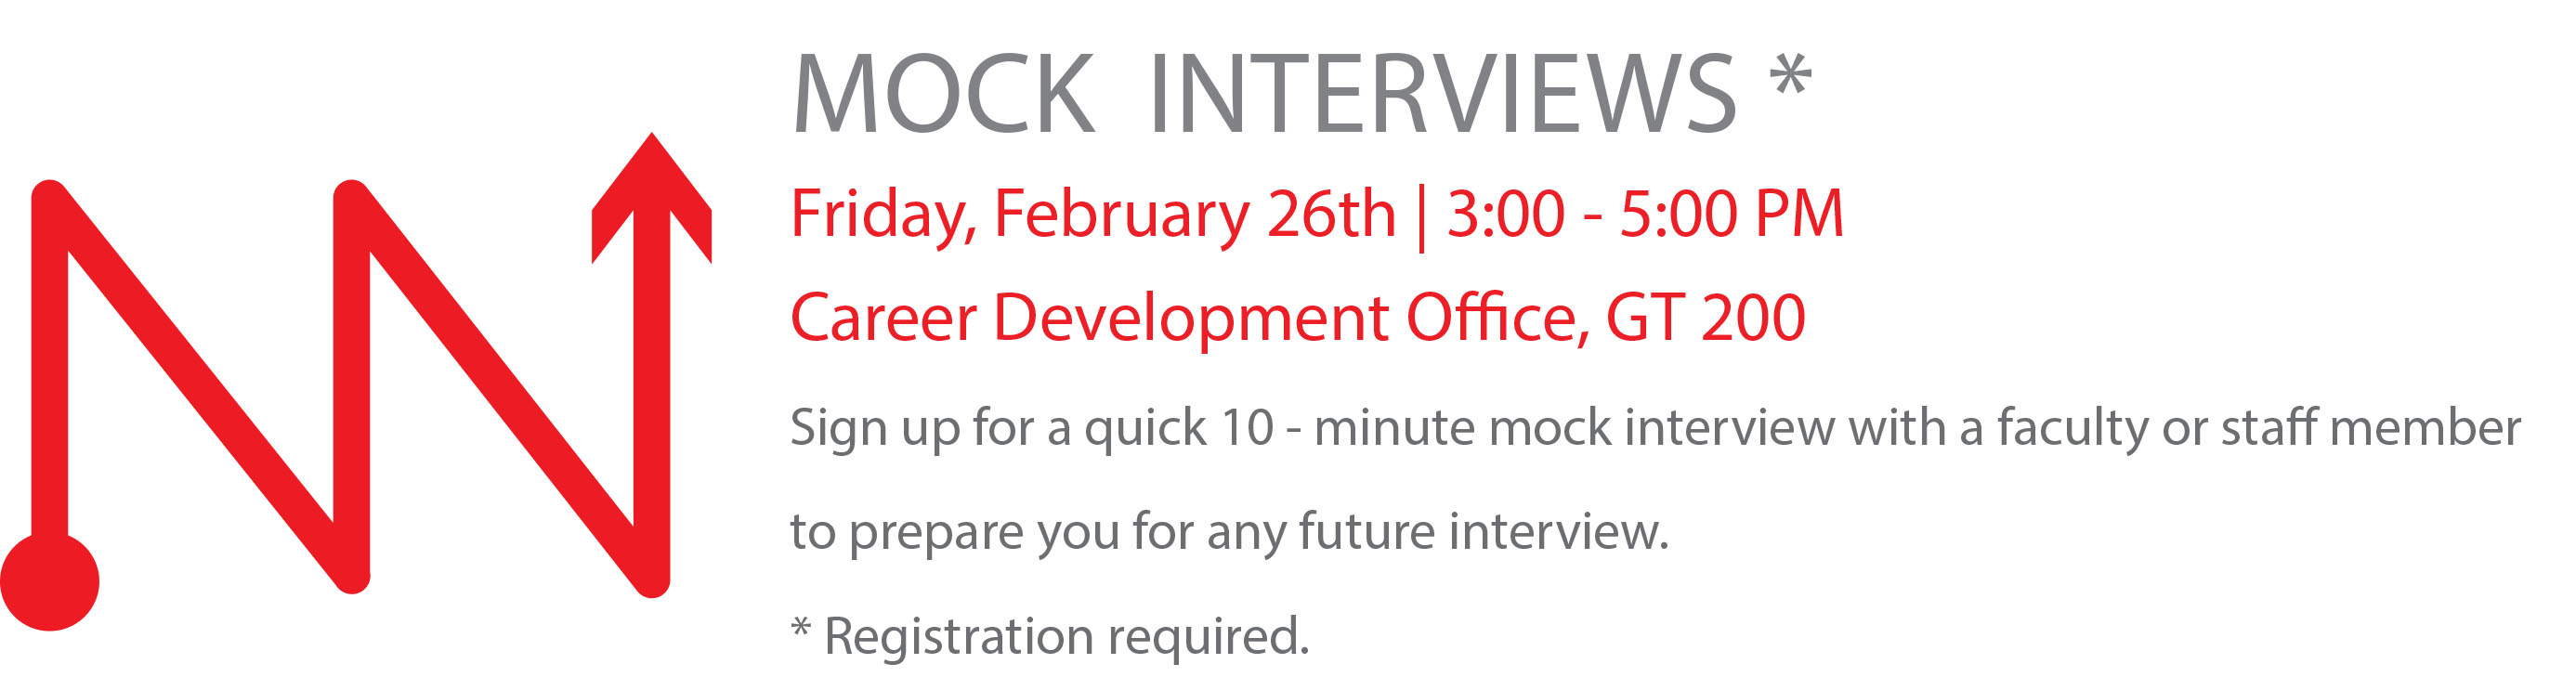 2016 Blog Mock Interviews